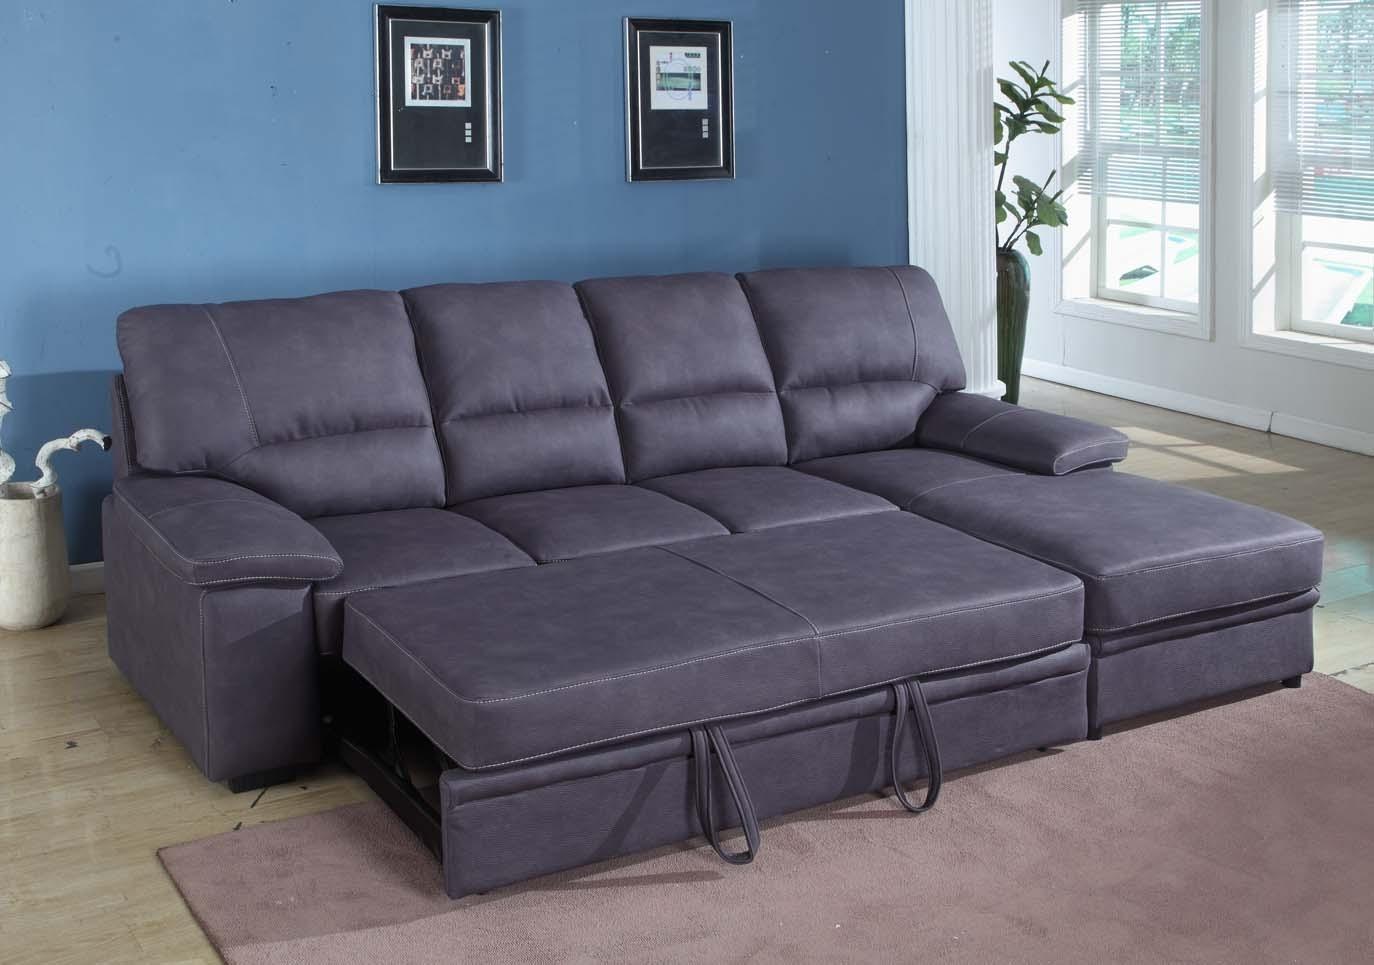 Grey Sleeper Sectional Sofa | Houston Mattress King Regarding Sectional Sofas With Sleeper (Image 2 of 10)